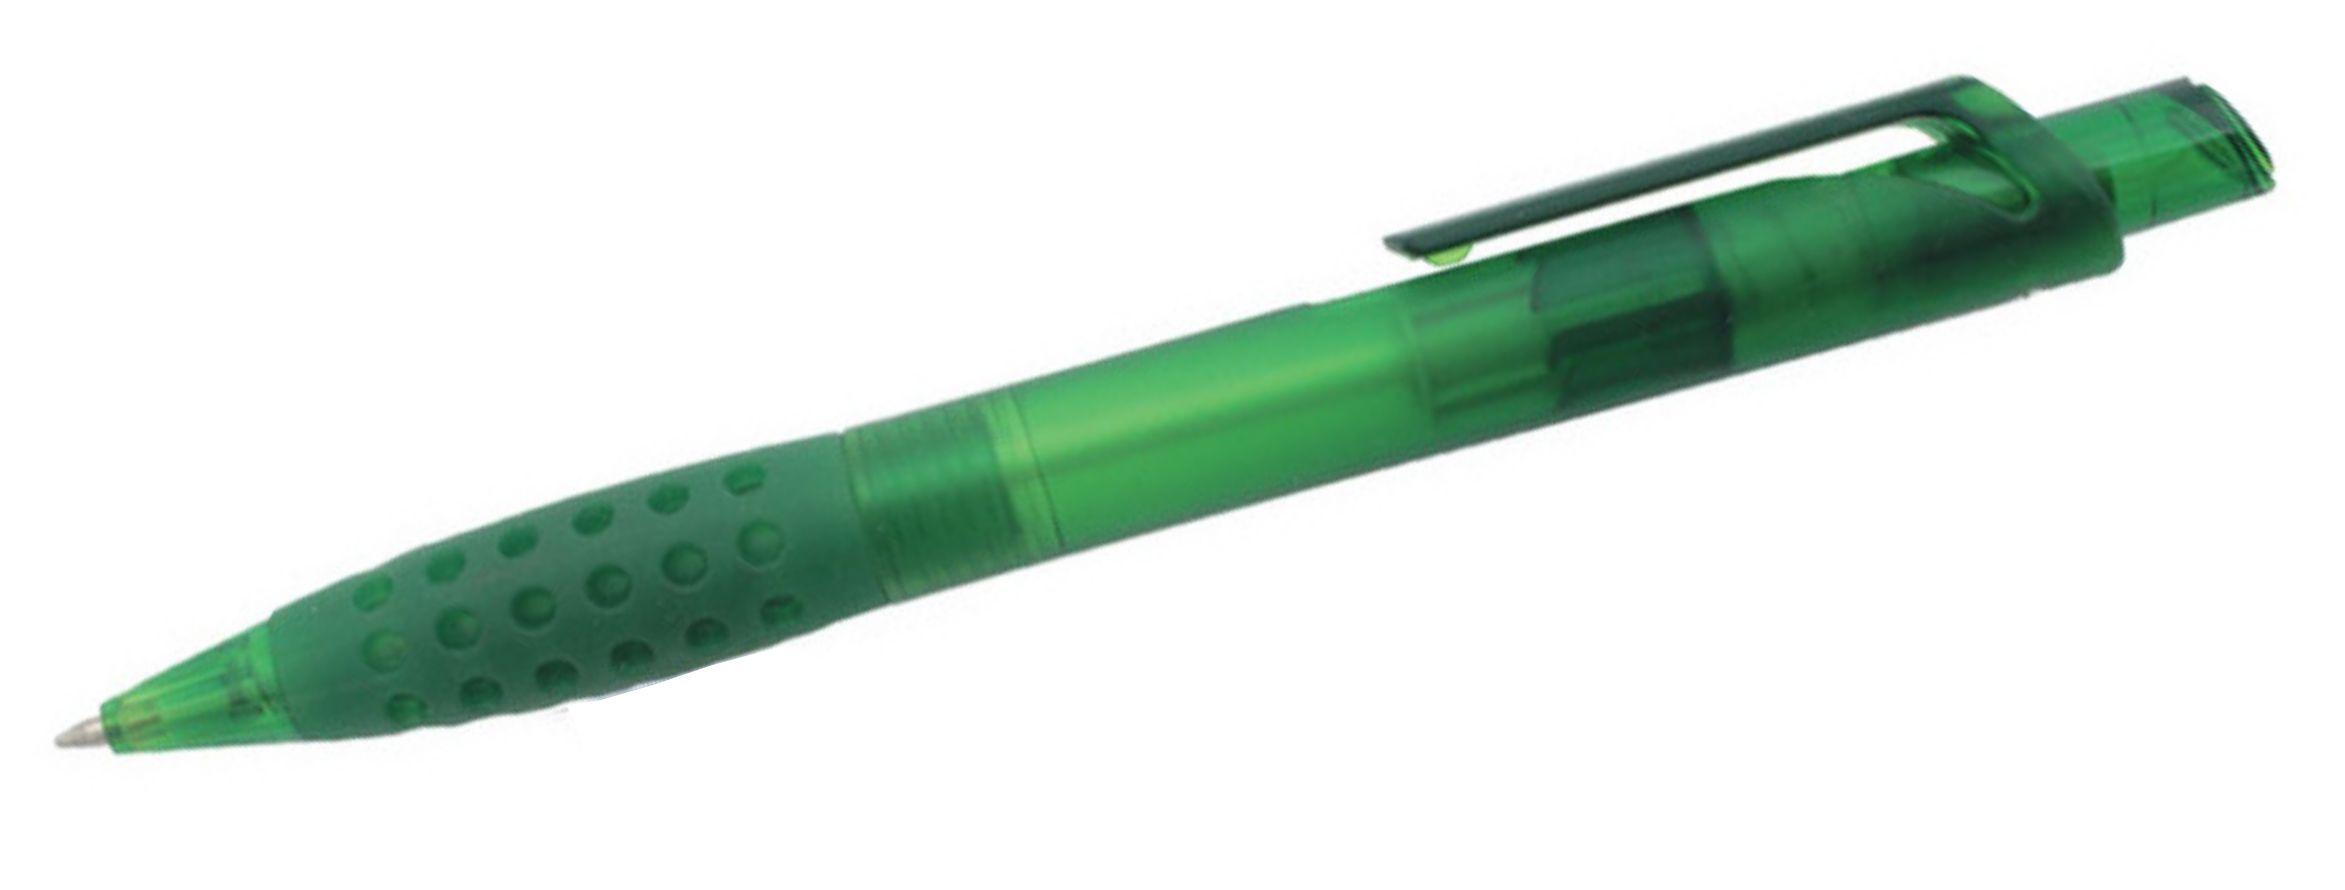 промо ручки под нанесение